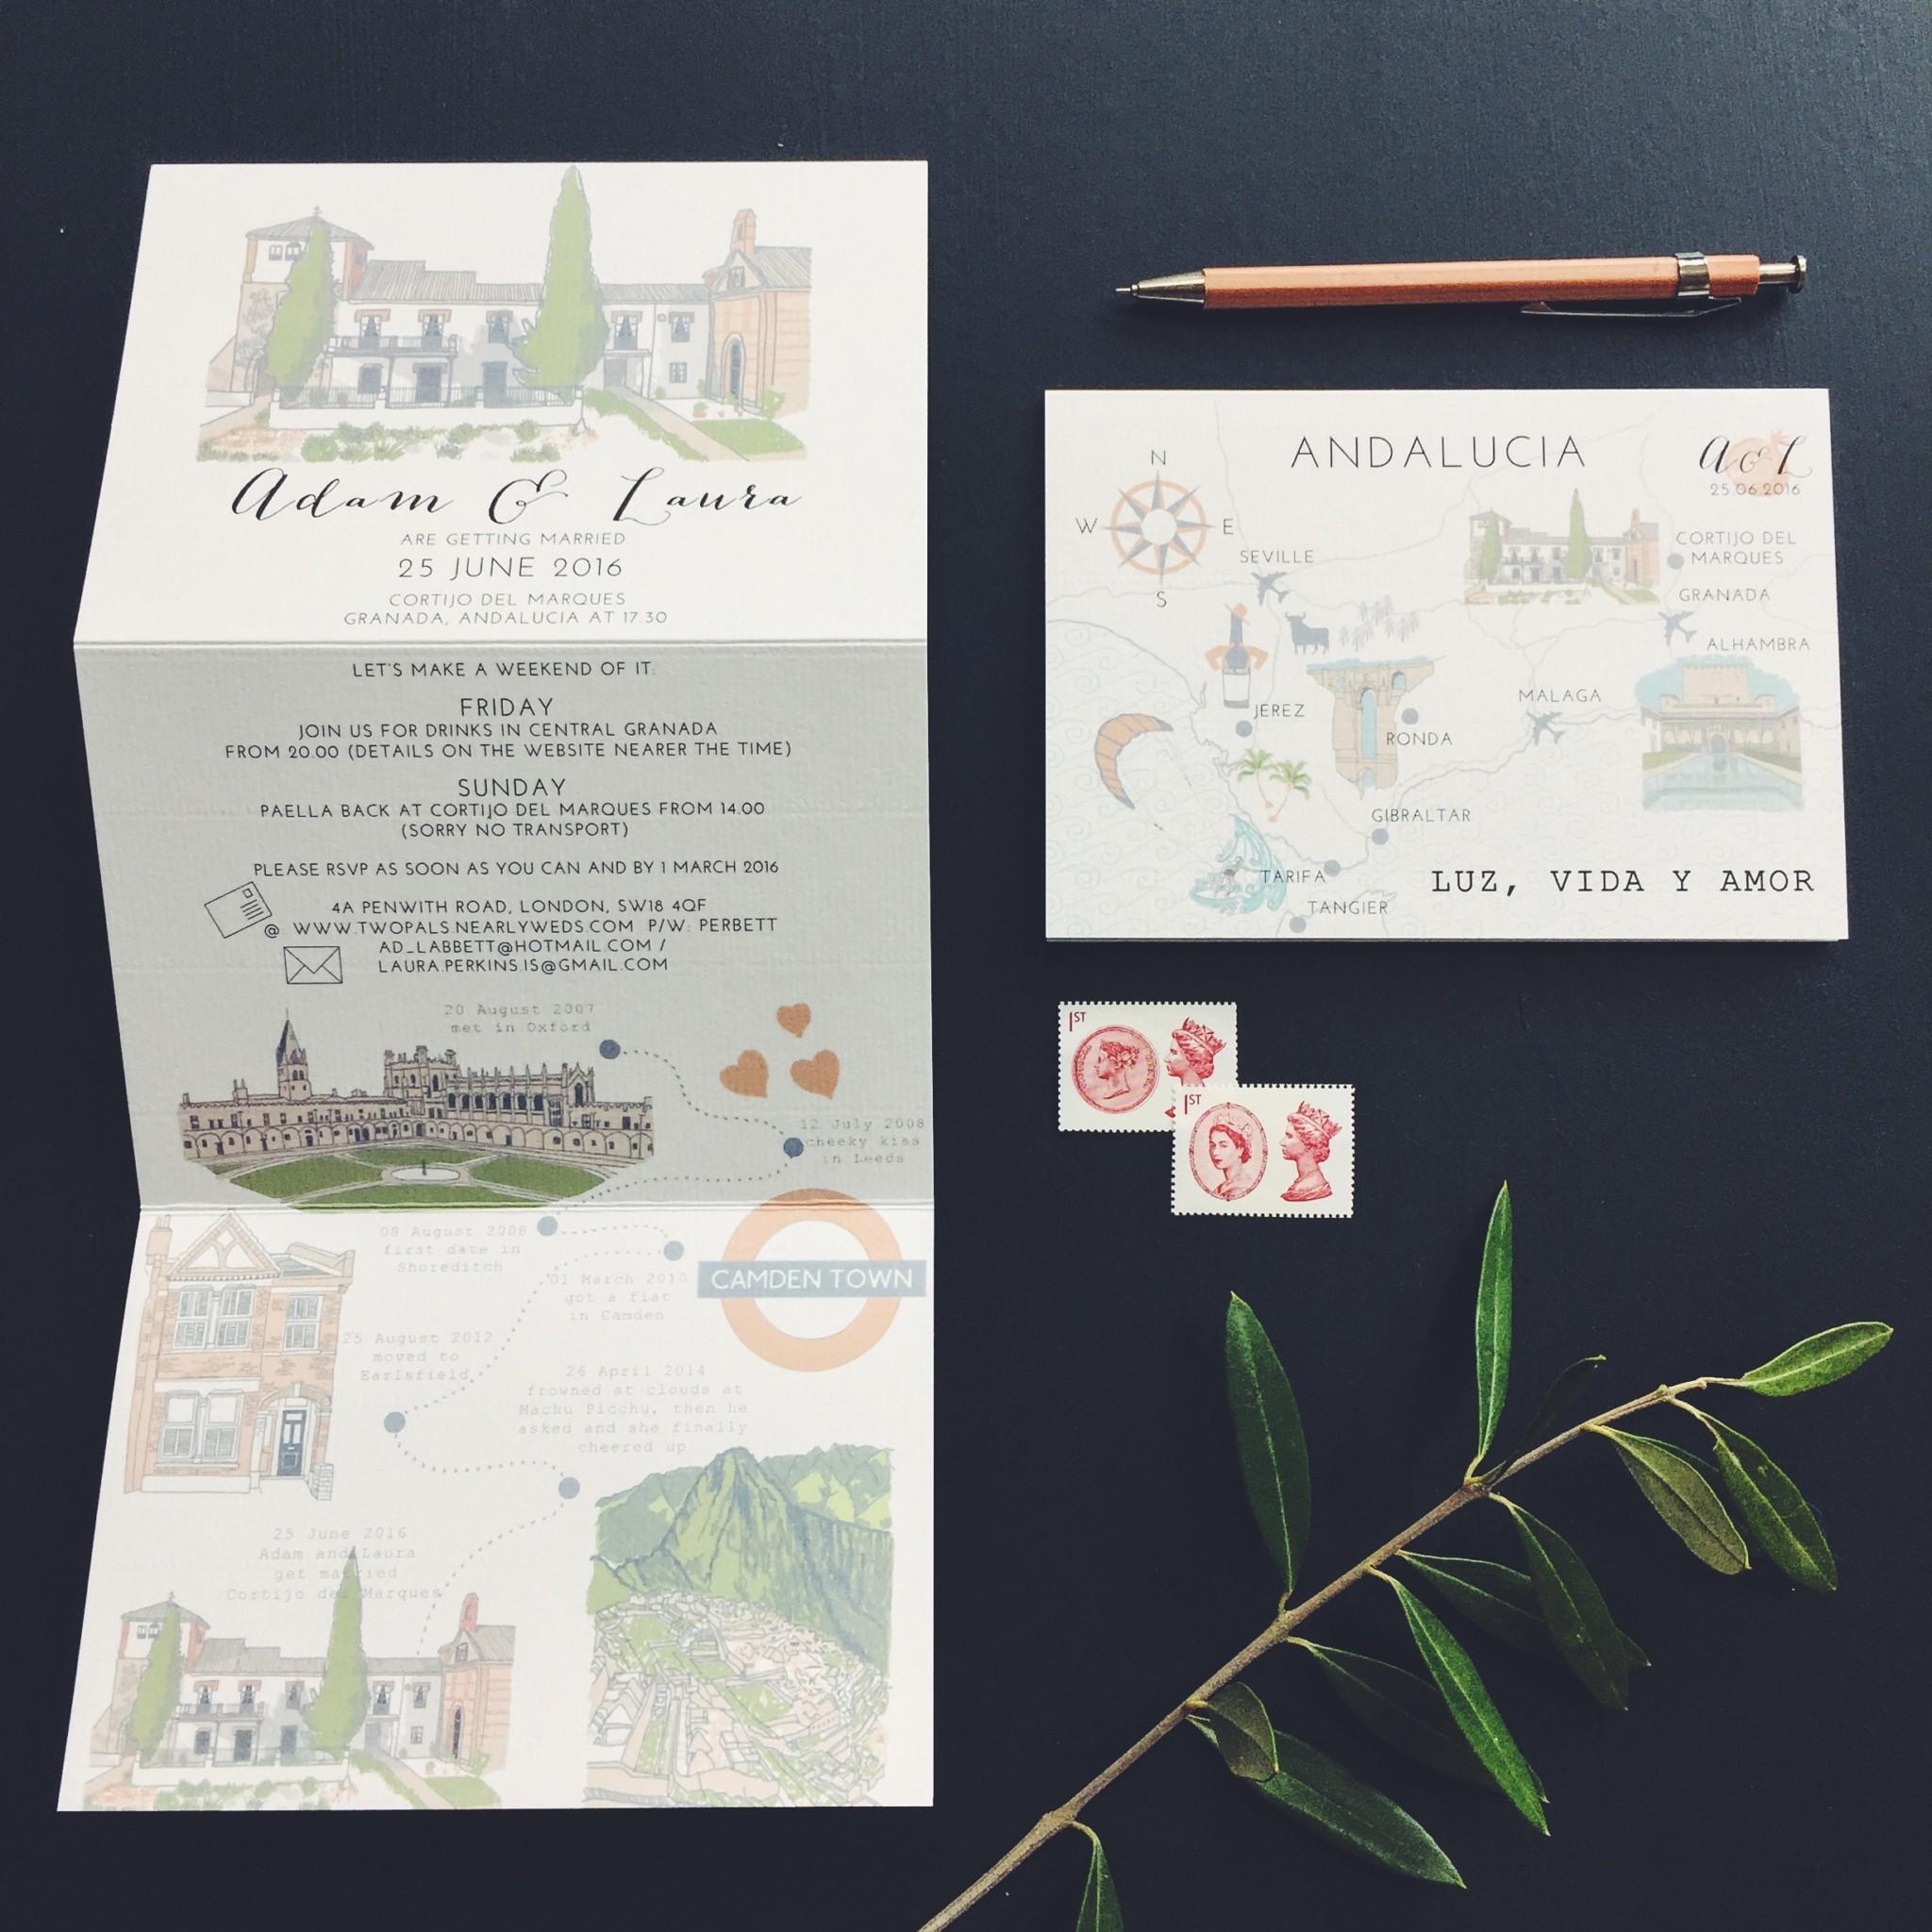 bespoke stationery hand illustrated spanish wedding granada cortijo del marques